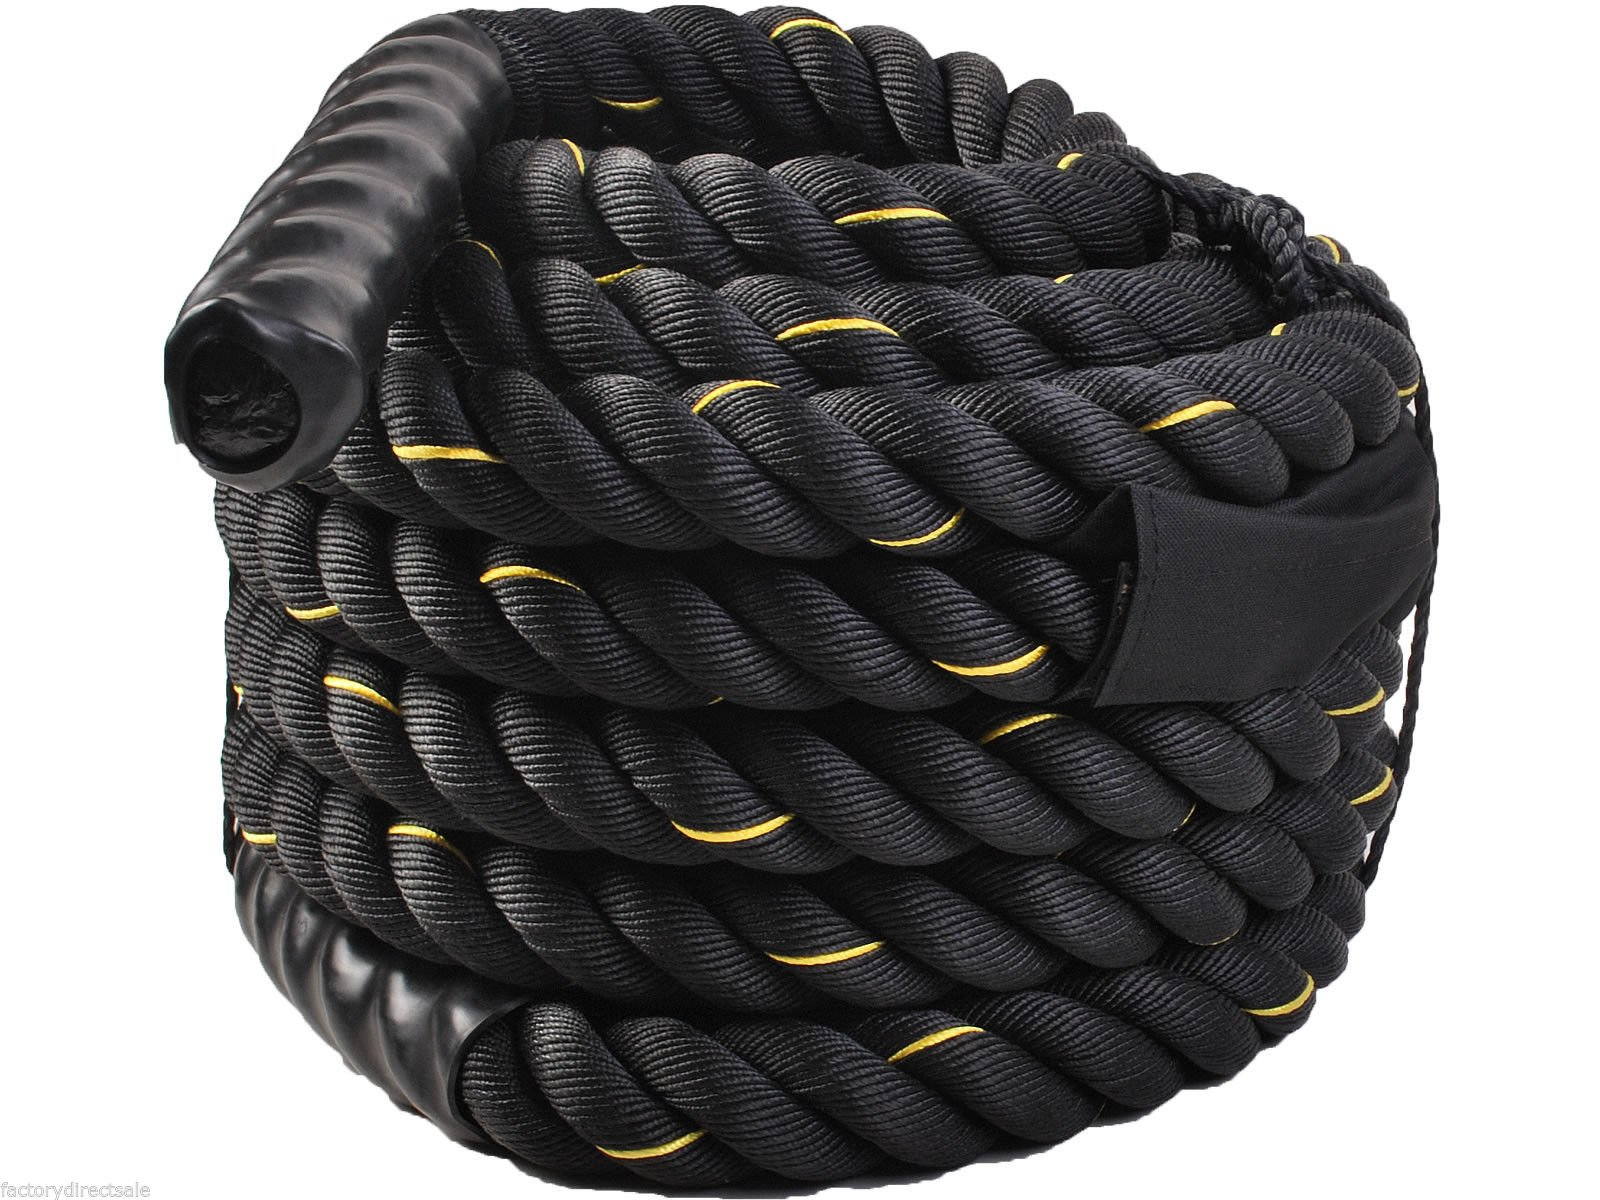 Giantex 1.5'' Workout Strength Training Undulation Poly Dacron Battle Rope Black (40ft)